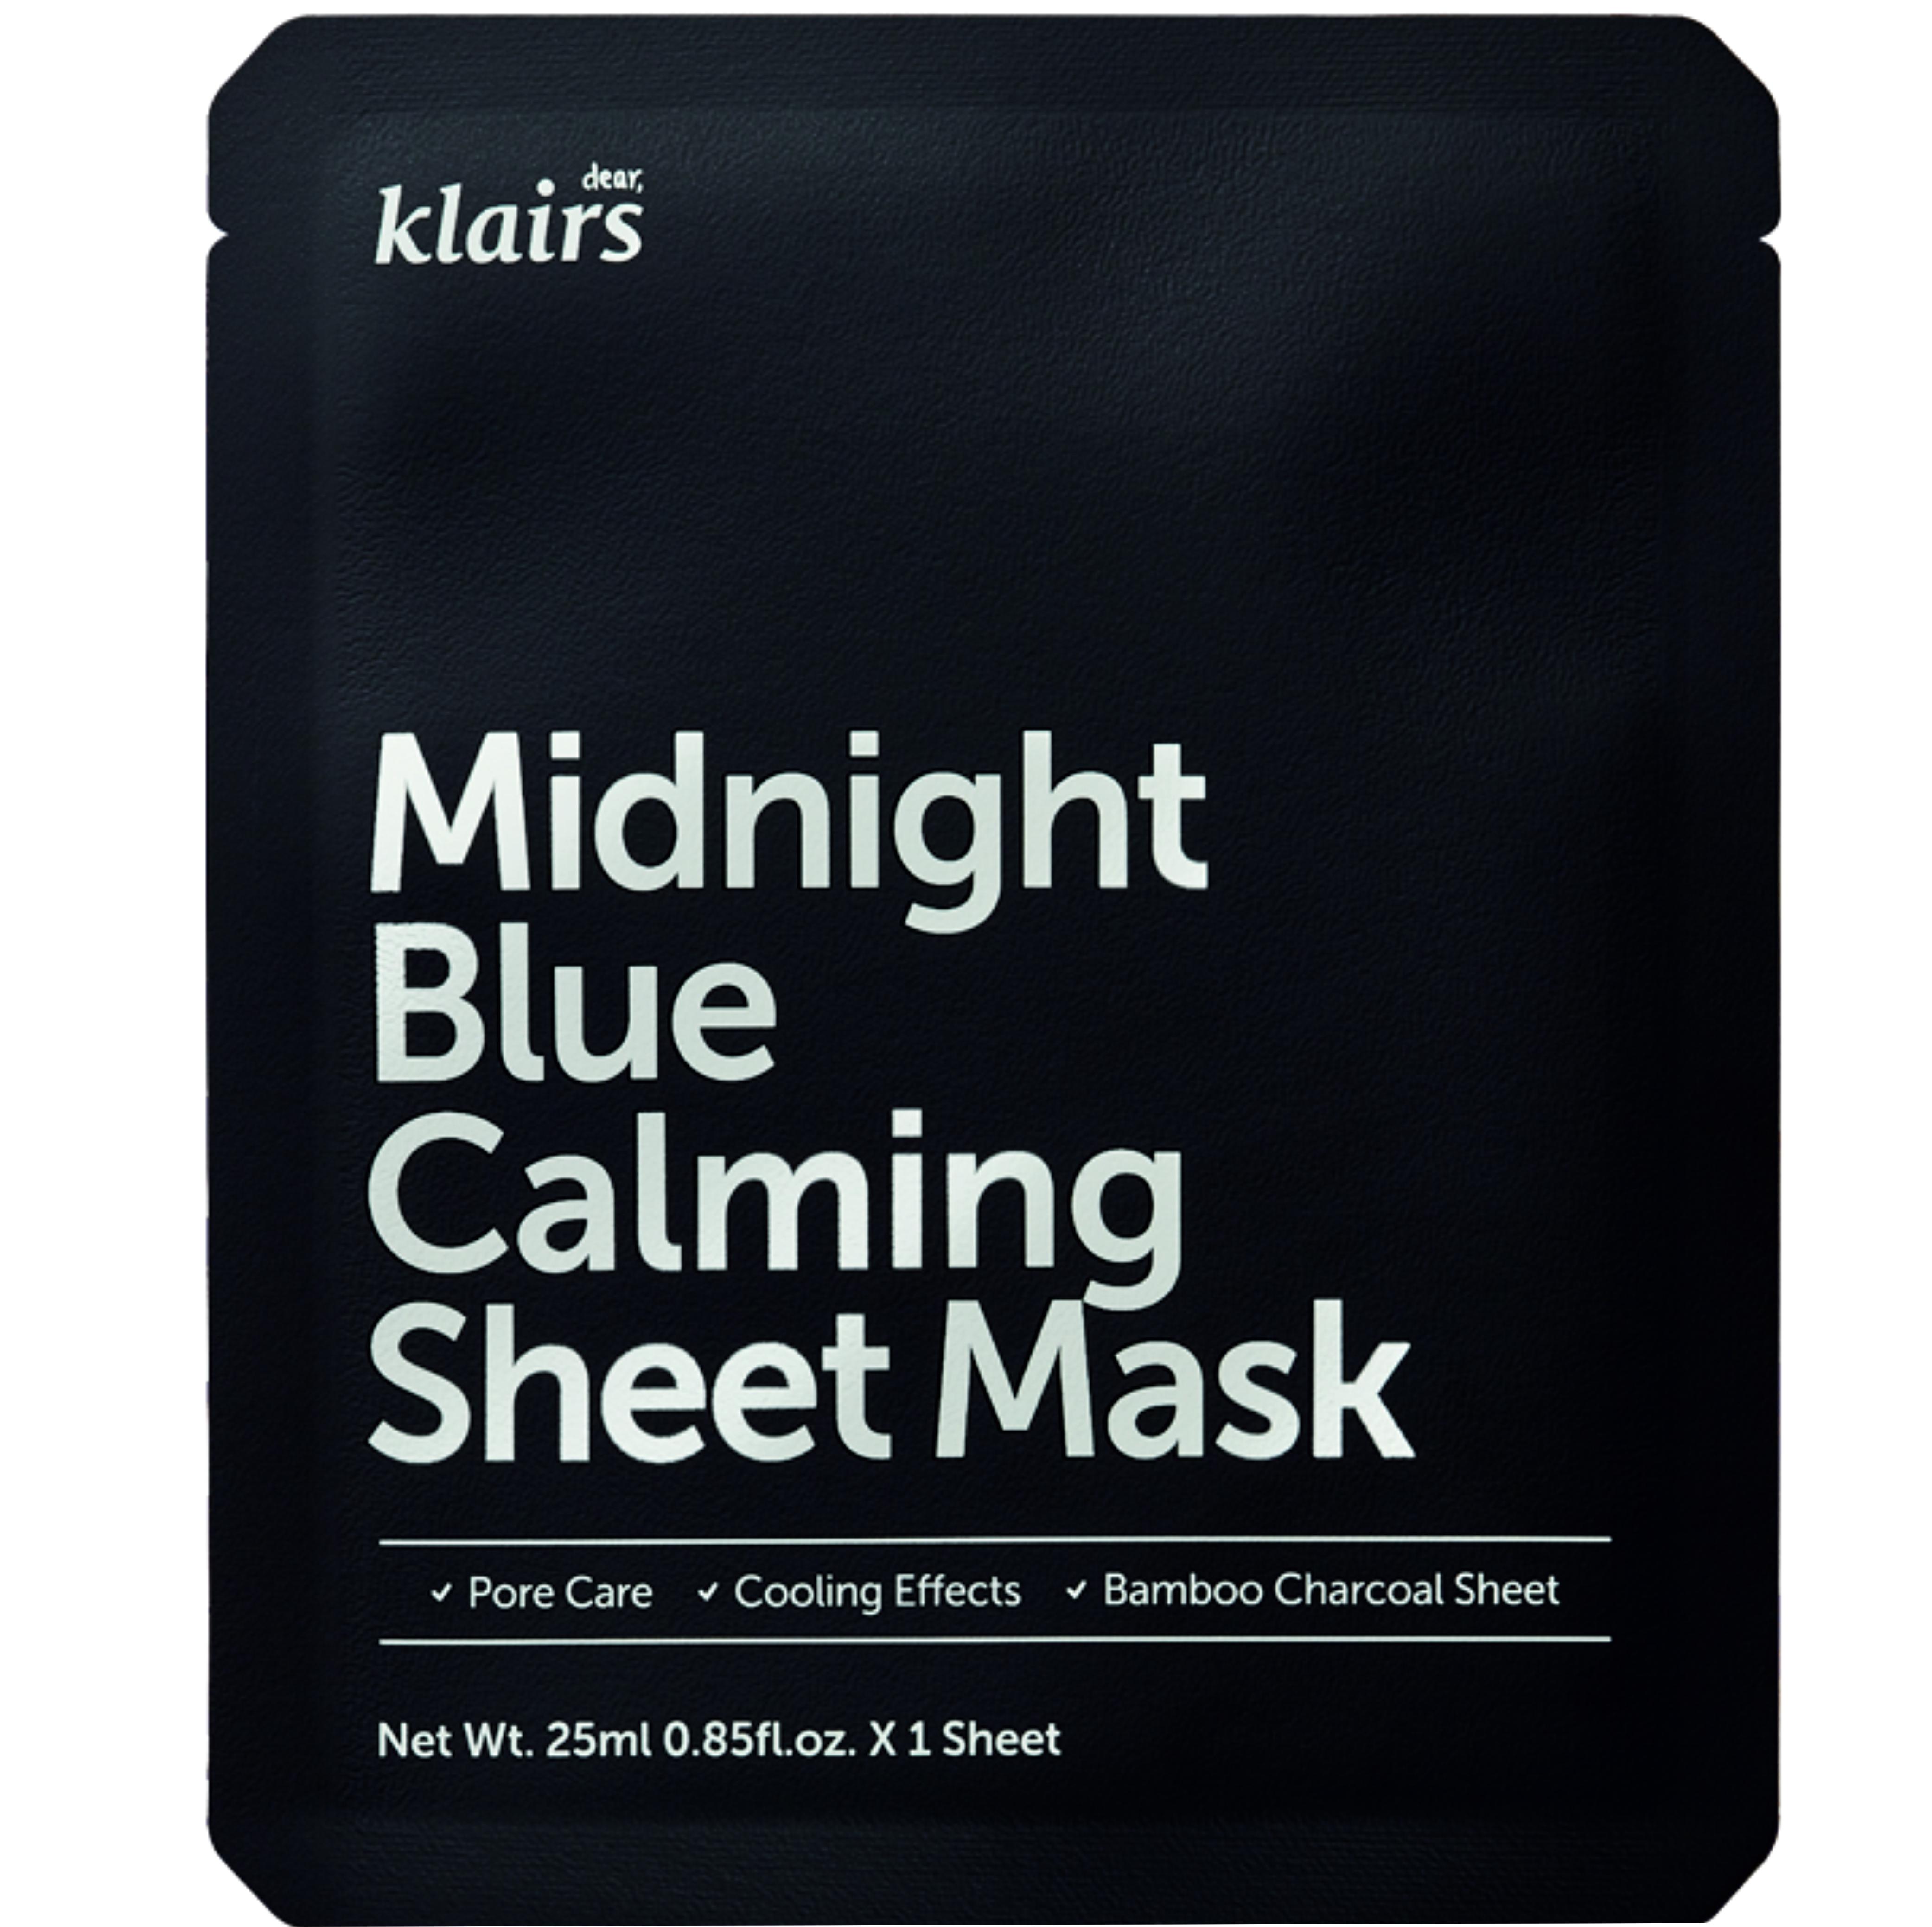 Dear Klairs  Midnight Blue Calming Sheet Maske